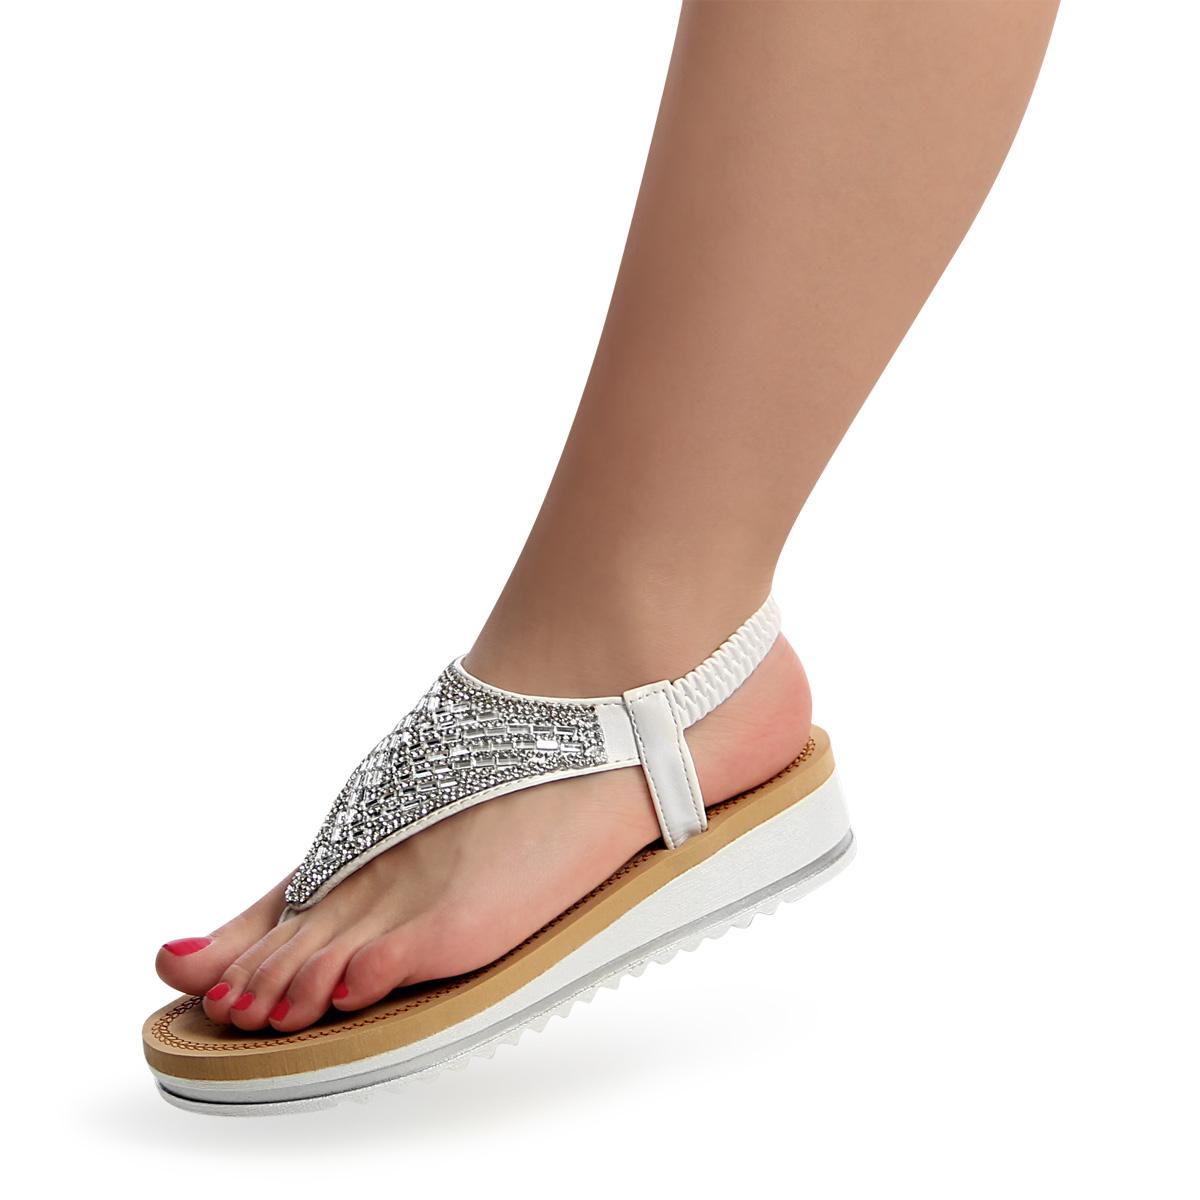 Damenschuhe Glitzer Sandalen Zehentrenner Sandaletten